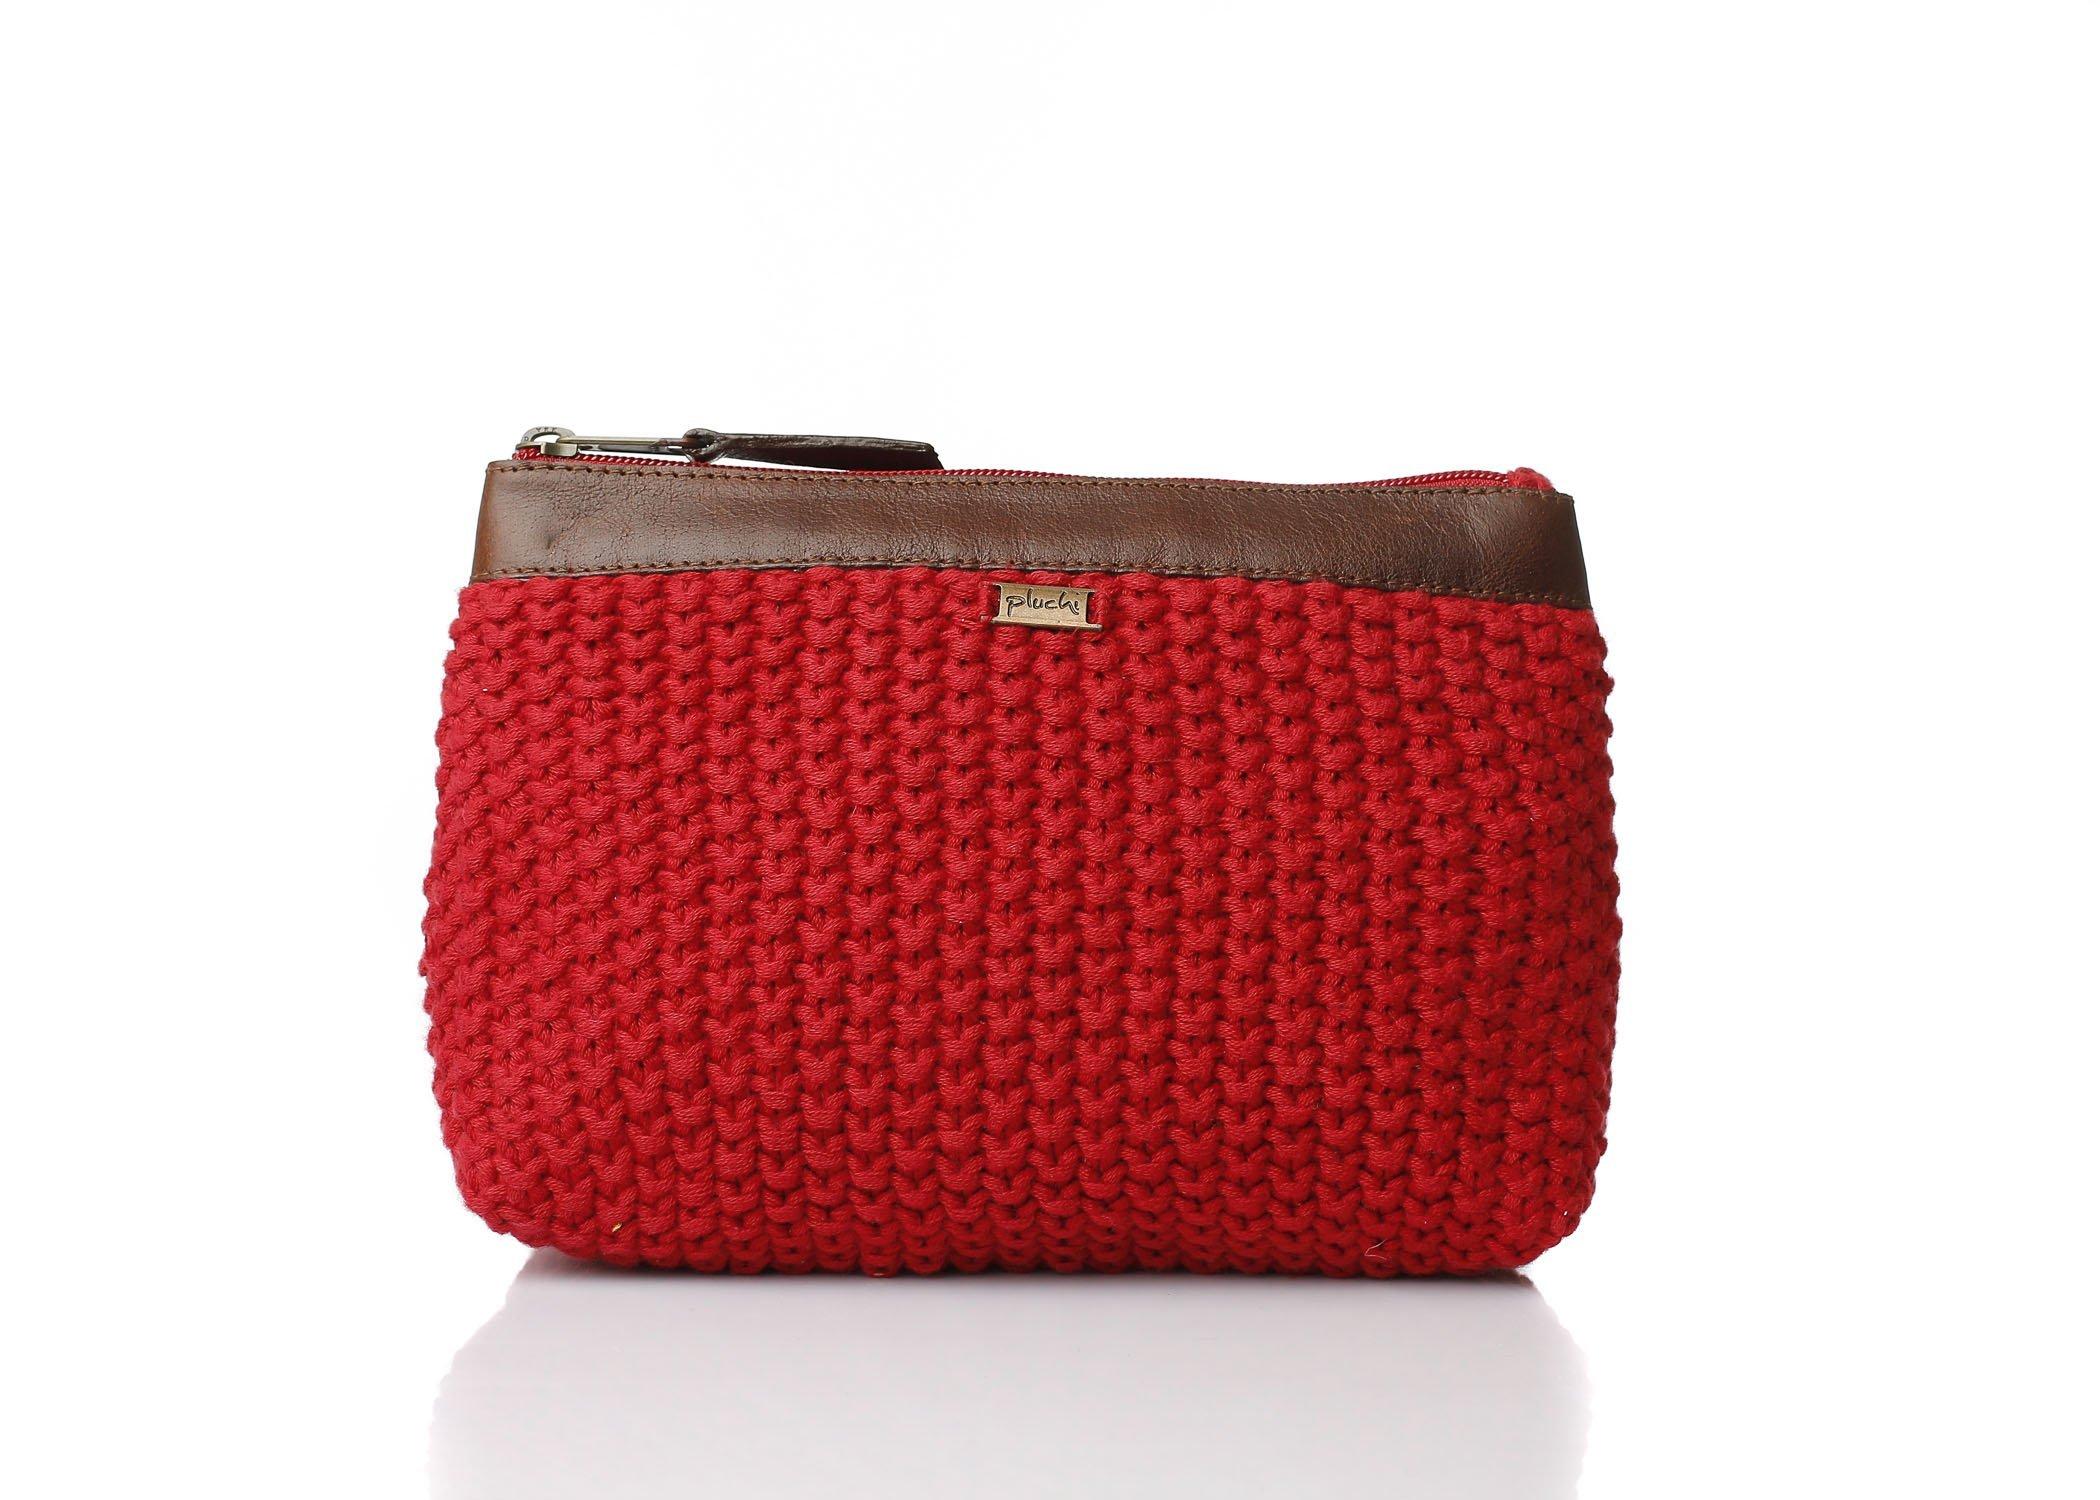 Pluchi Travel Pouch/Handbag/Clutch Handbag (Veronica, 11x6.5)